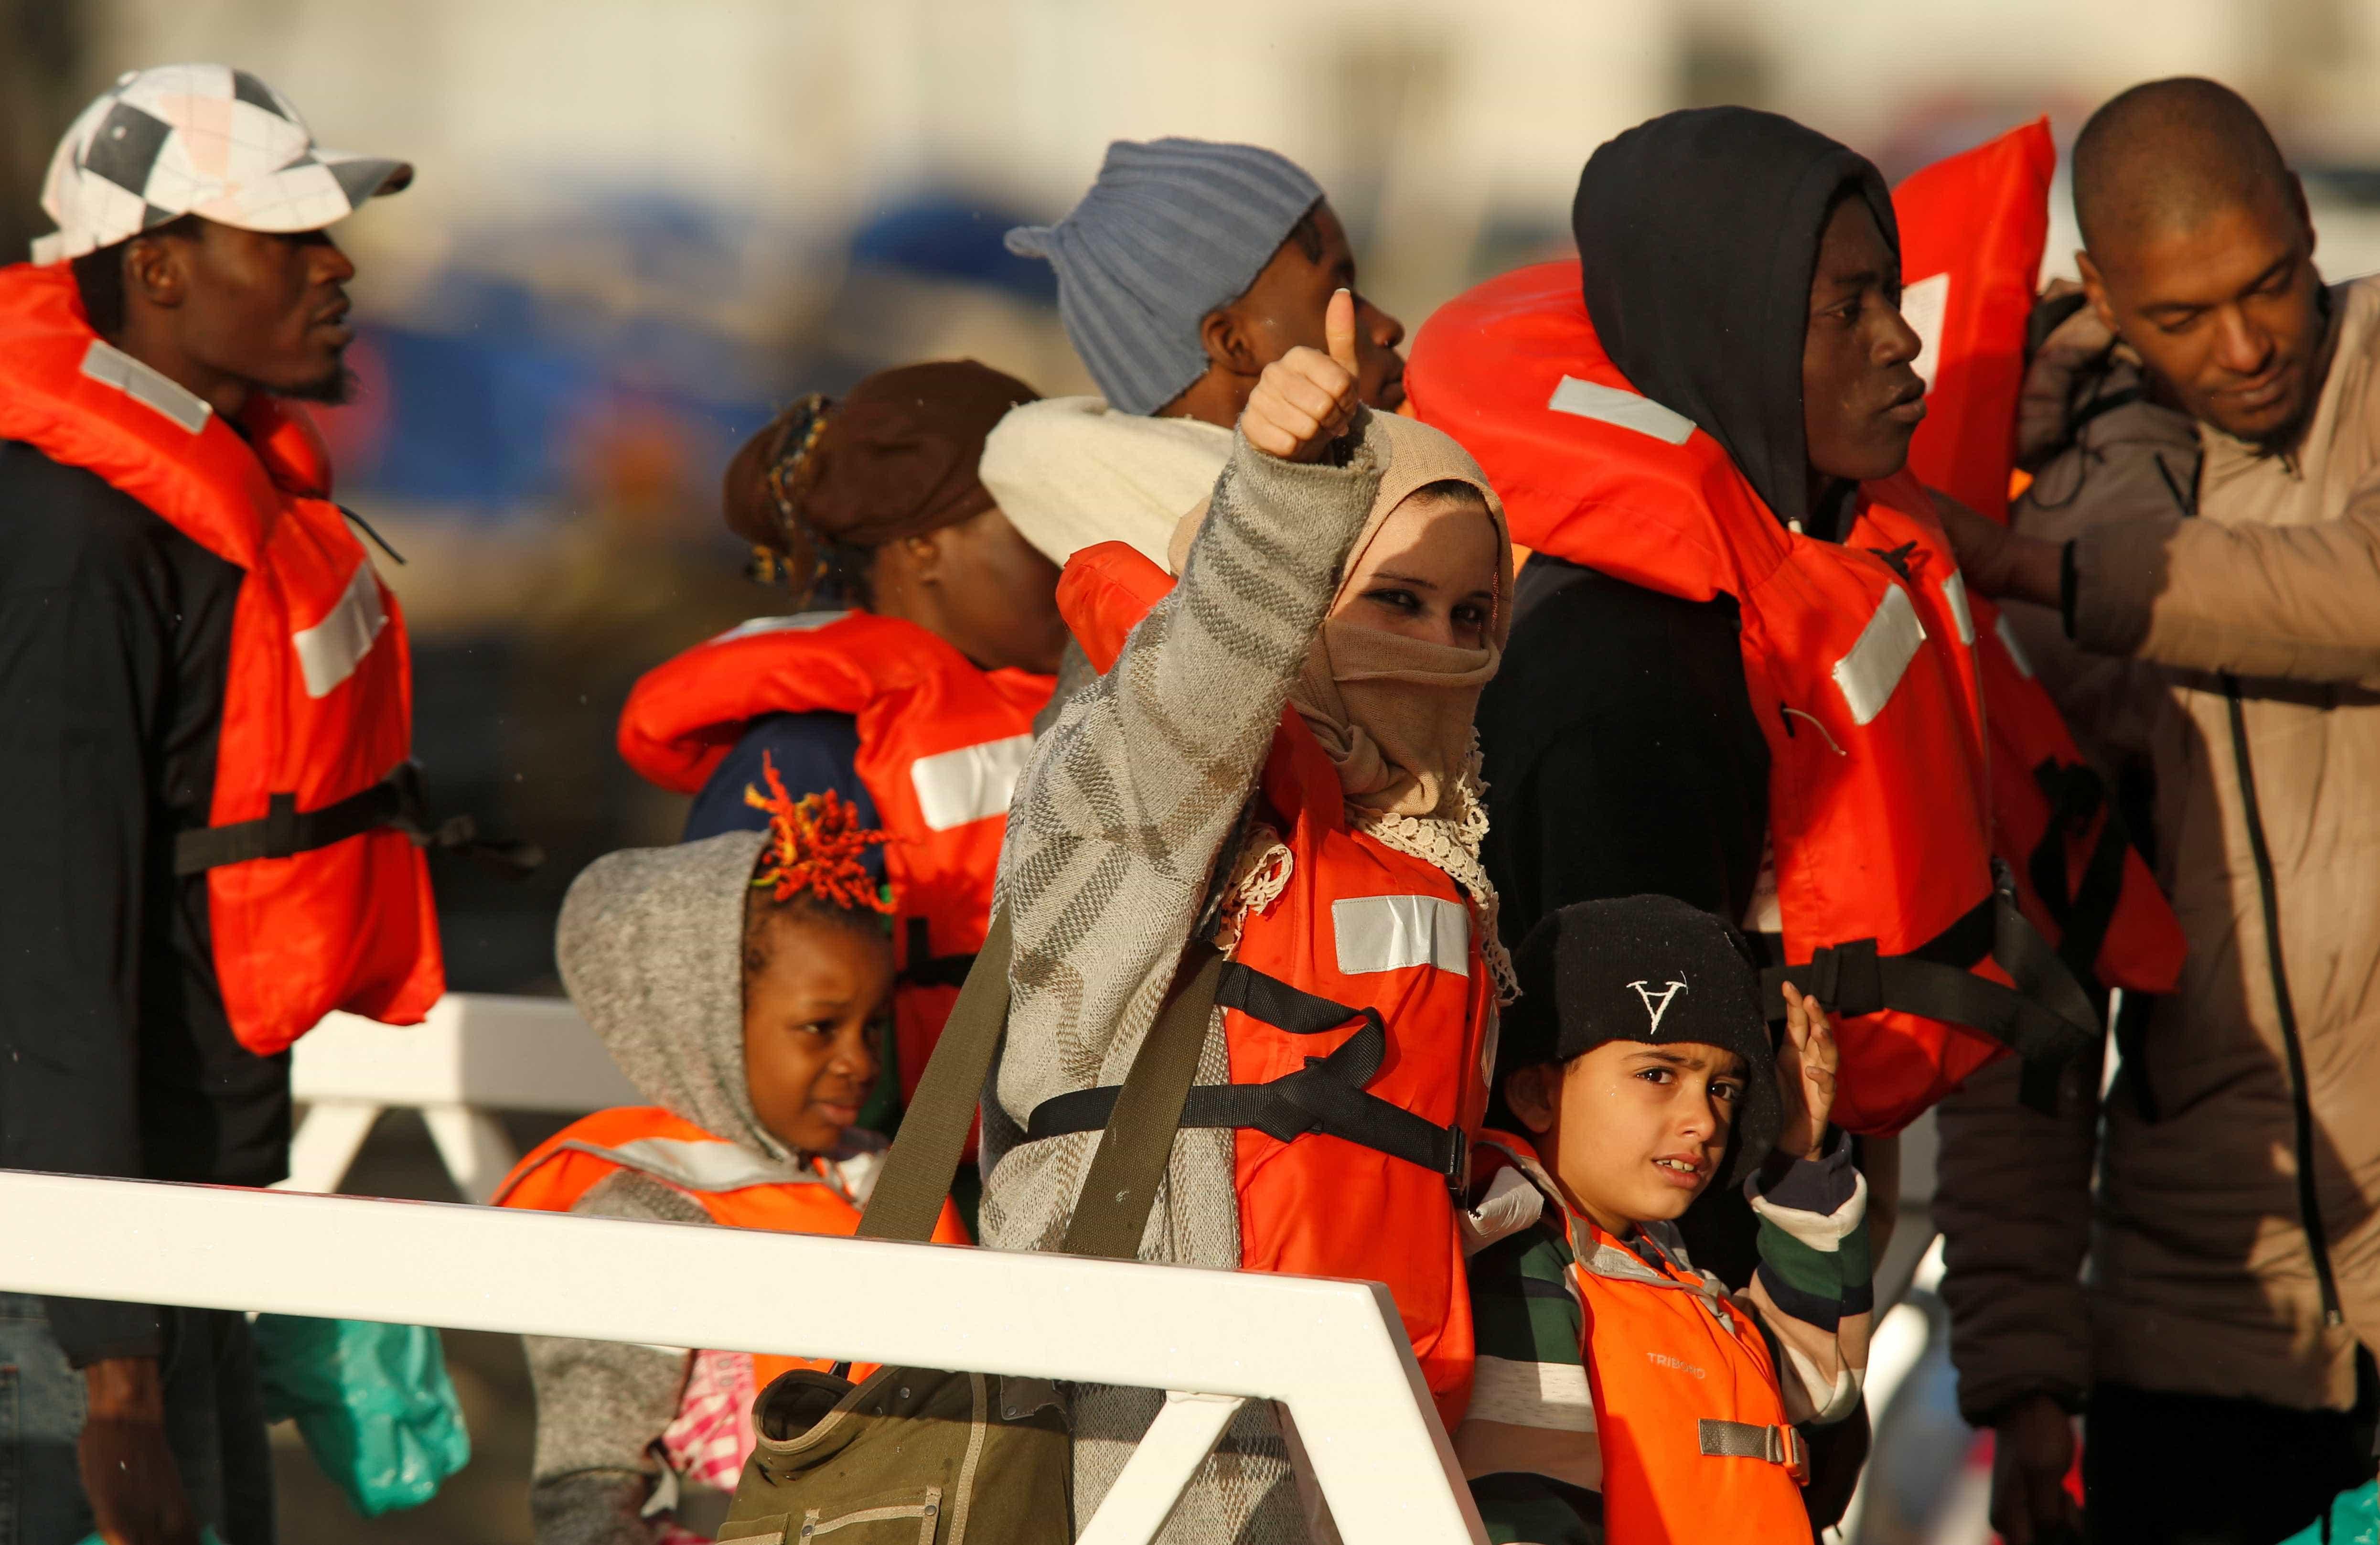 Malta anuncia acordo para redistribuir imigrantes à deriva